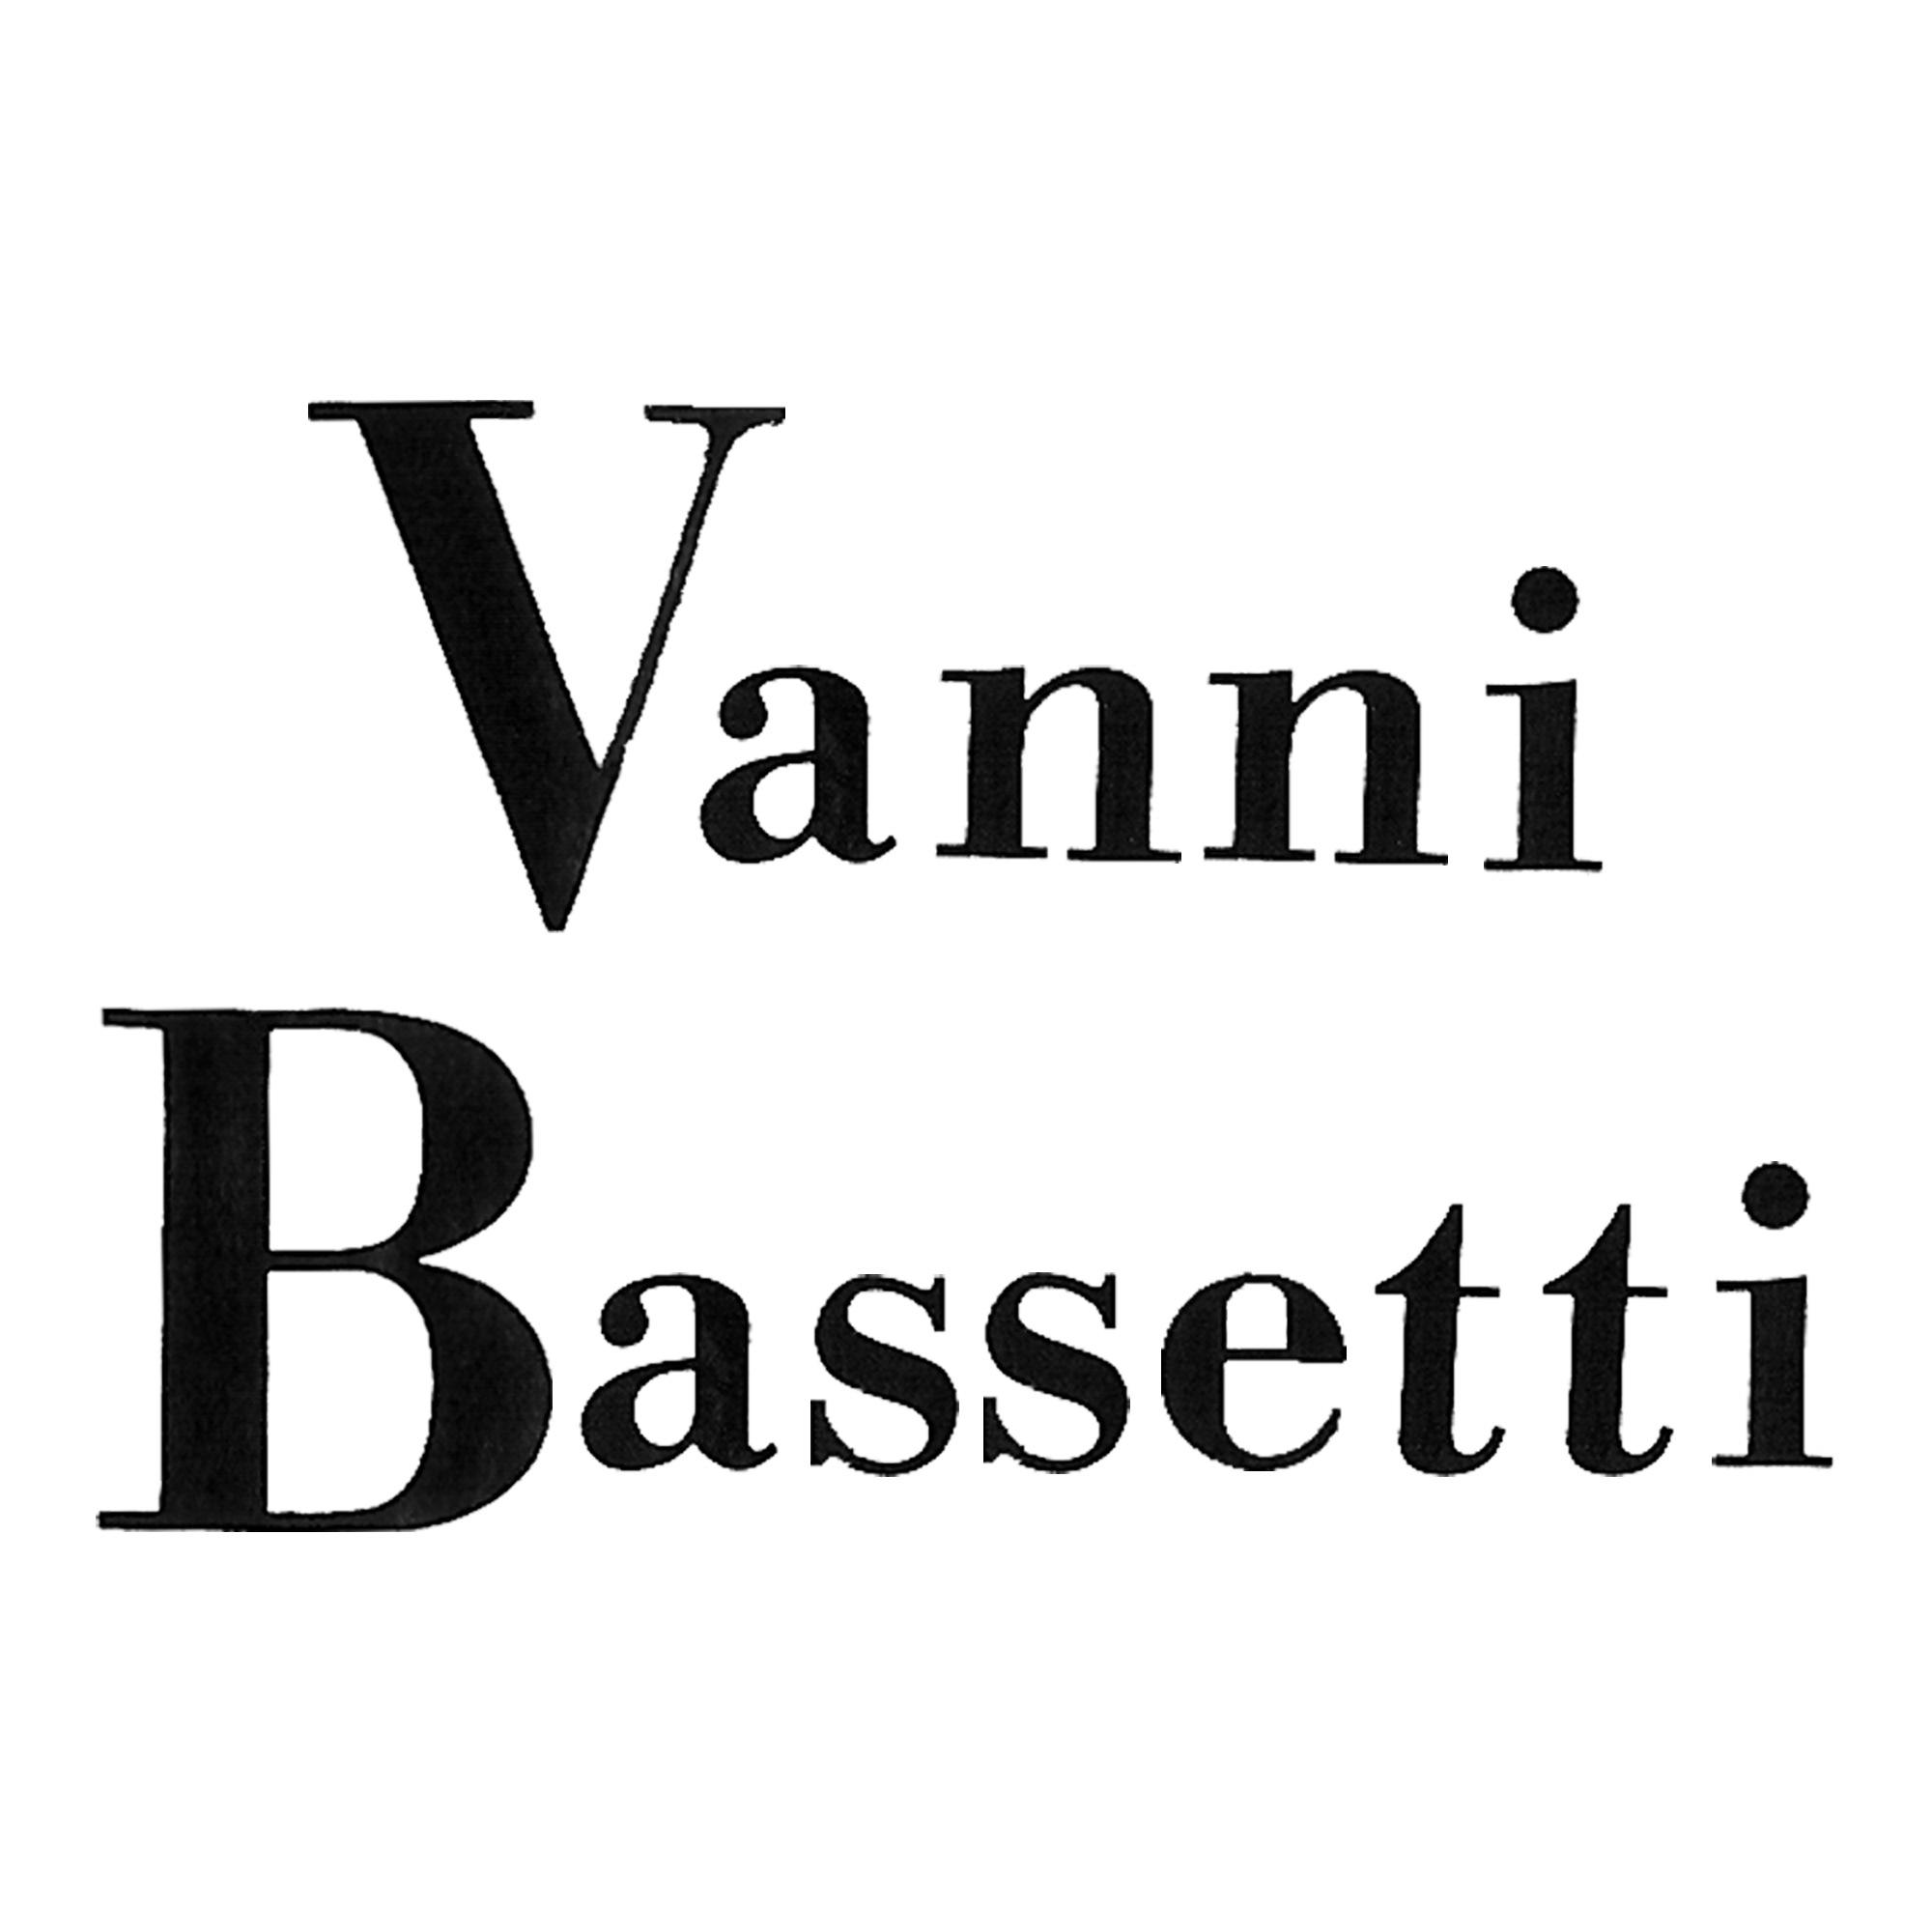 Vanni Bassetti